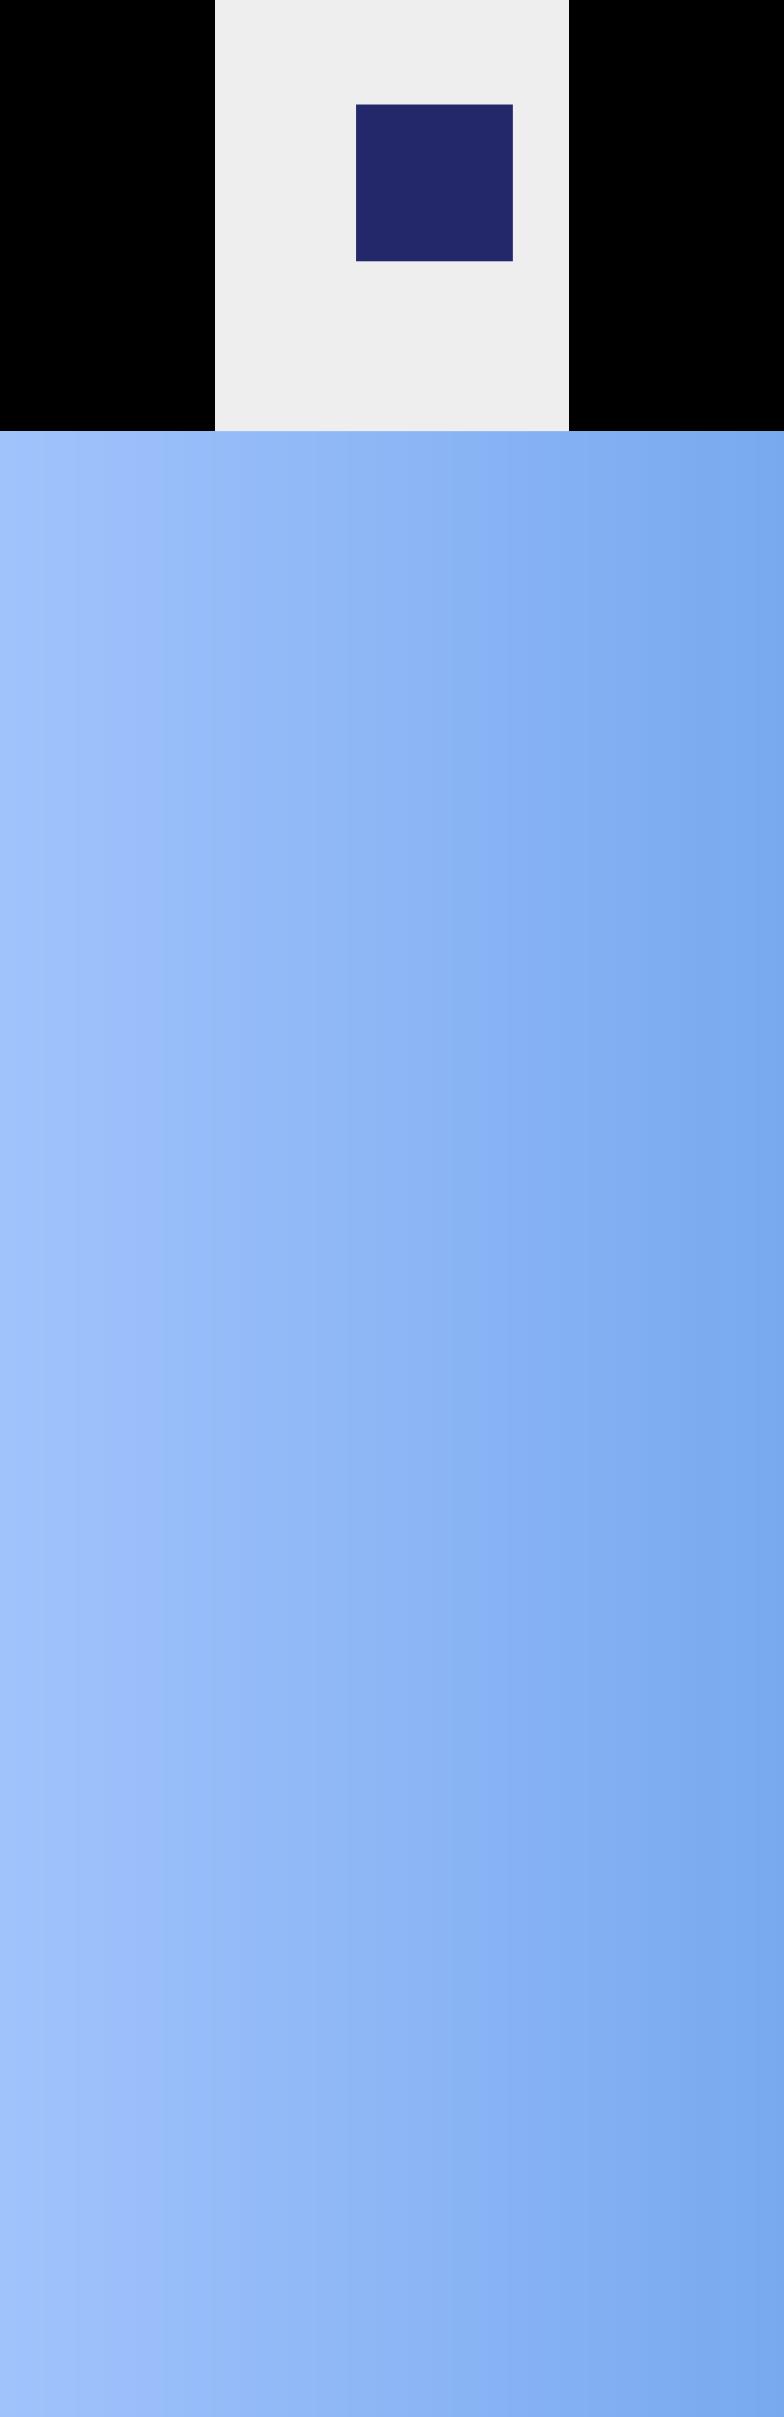 spray Clipart illustration in PNG, SVG